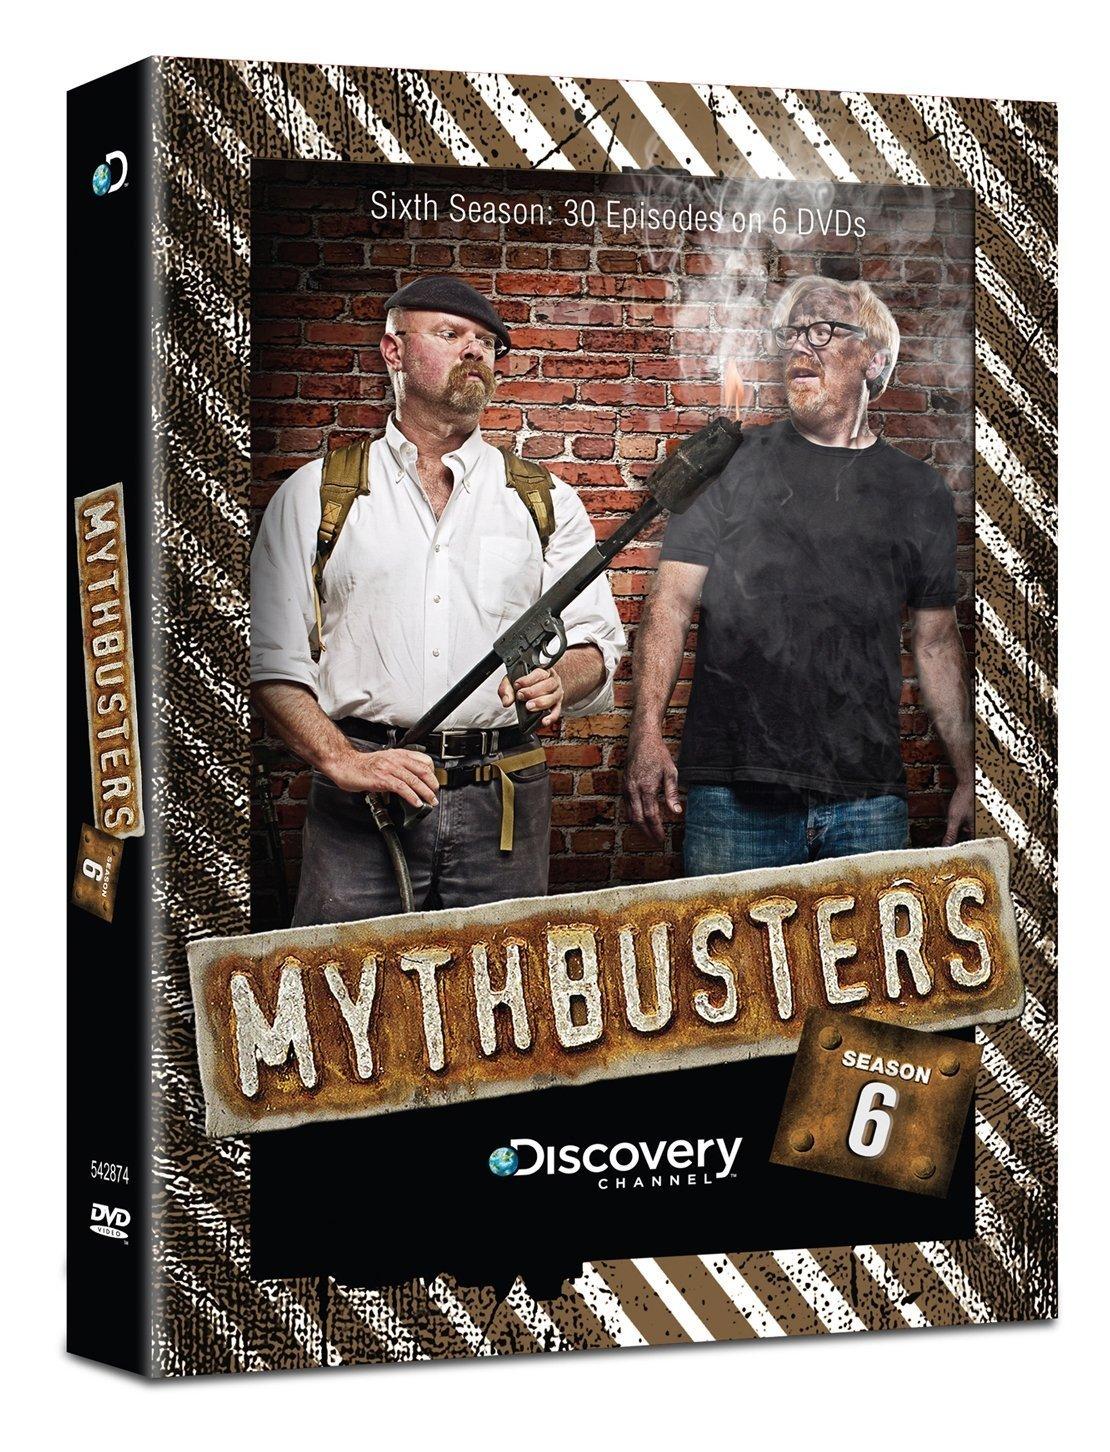 Mythbusters: Season 6